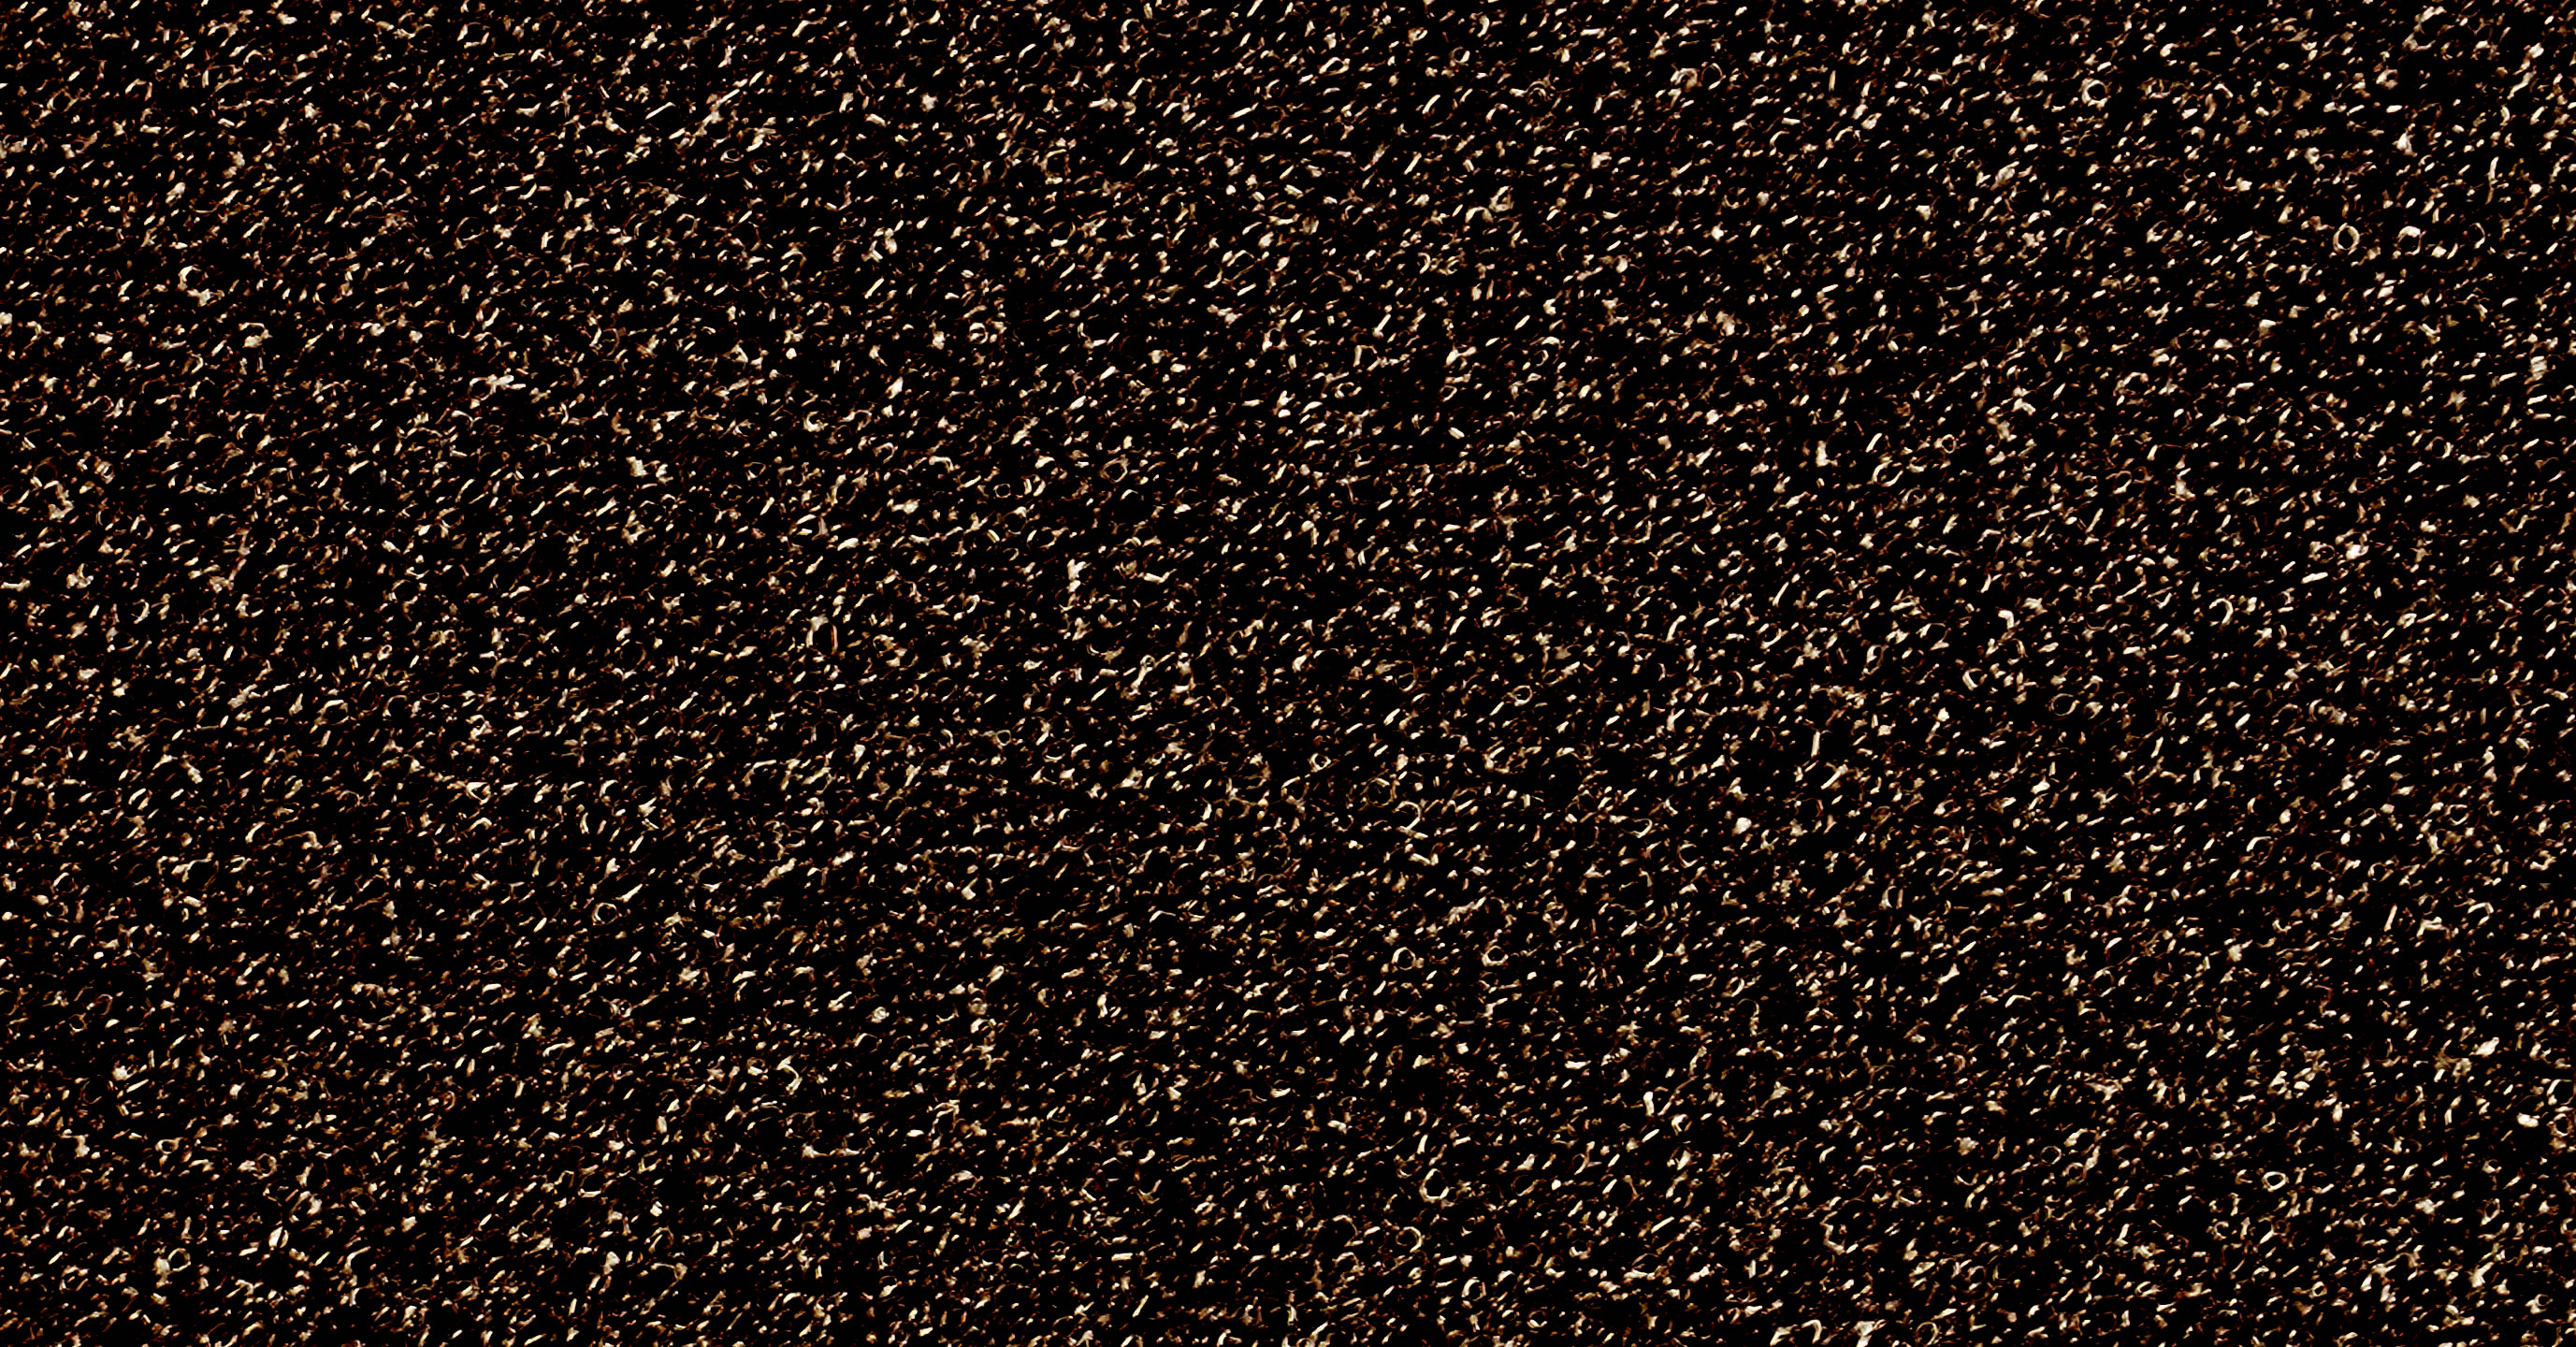 filterschaumstoff filter schaum schwarz 3 cm platte ppi 20 mittel ebay. Black Bedroom Furniture Sets. Home Design Ideas